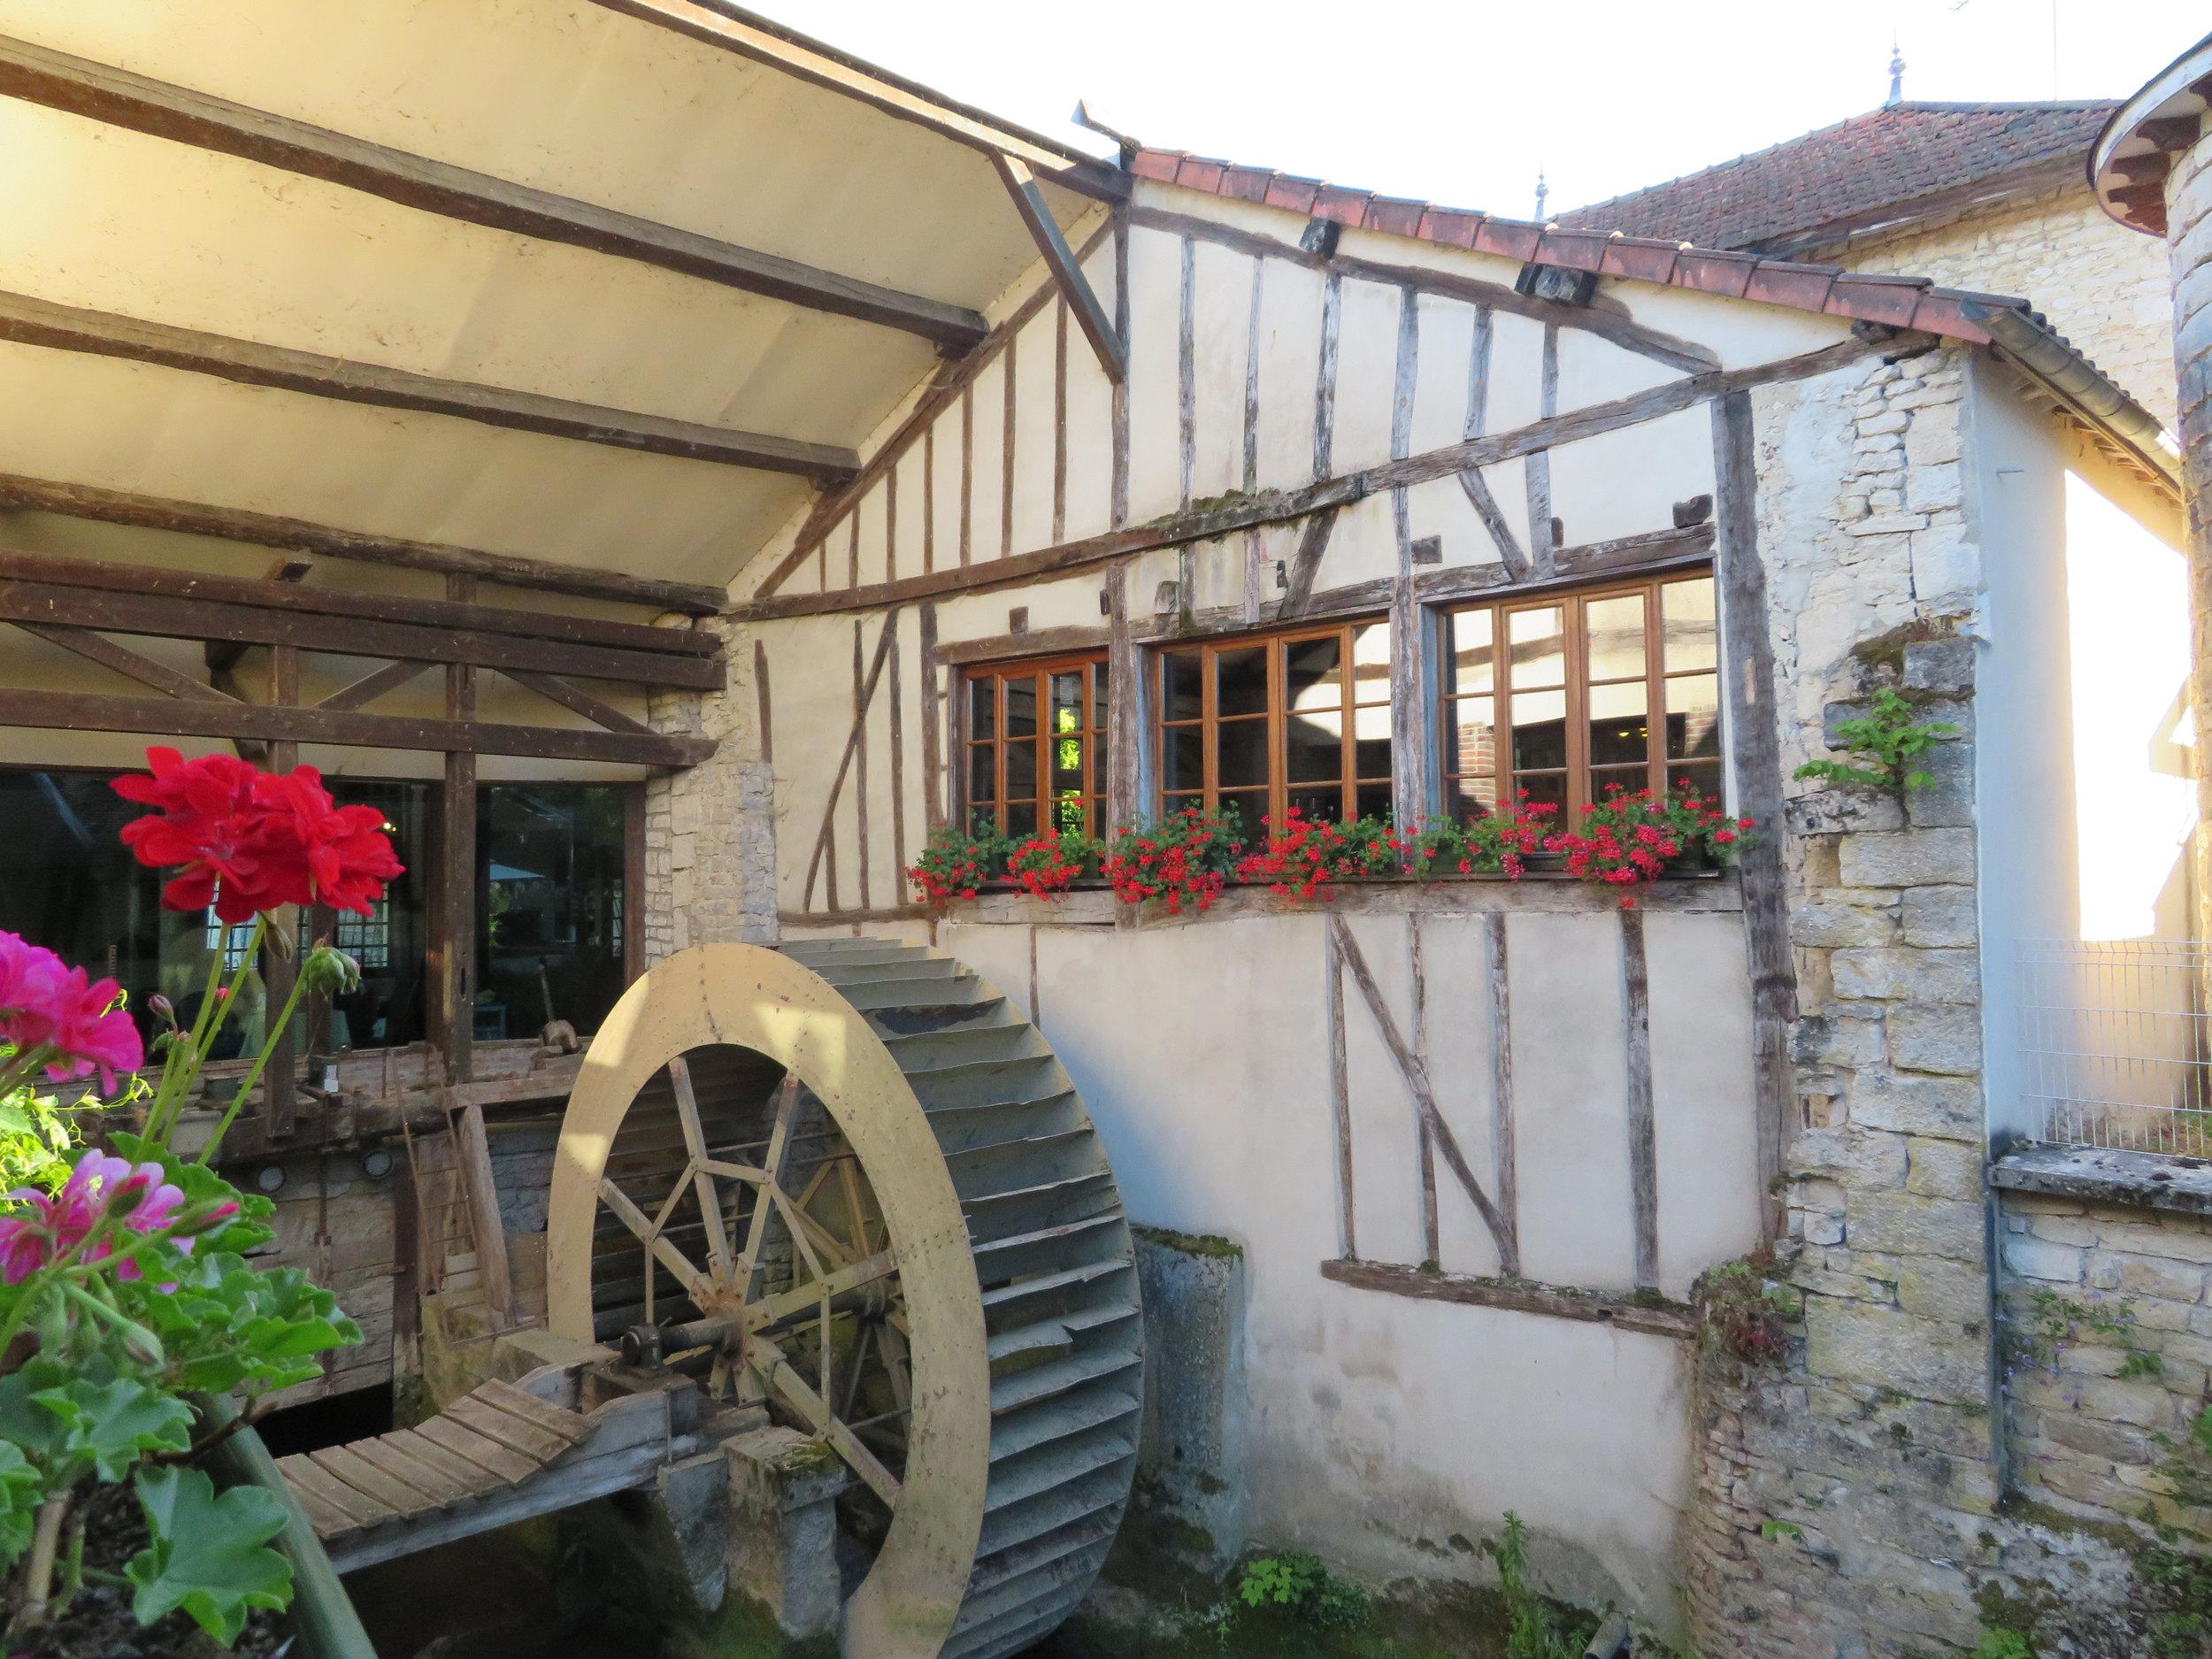 Waterwheel at the restaurant terrace